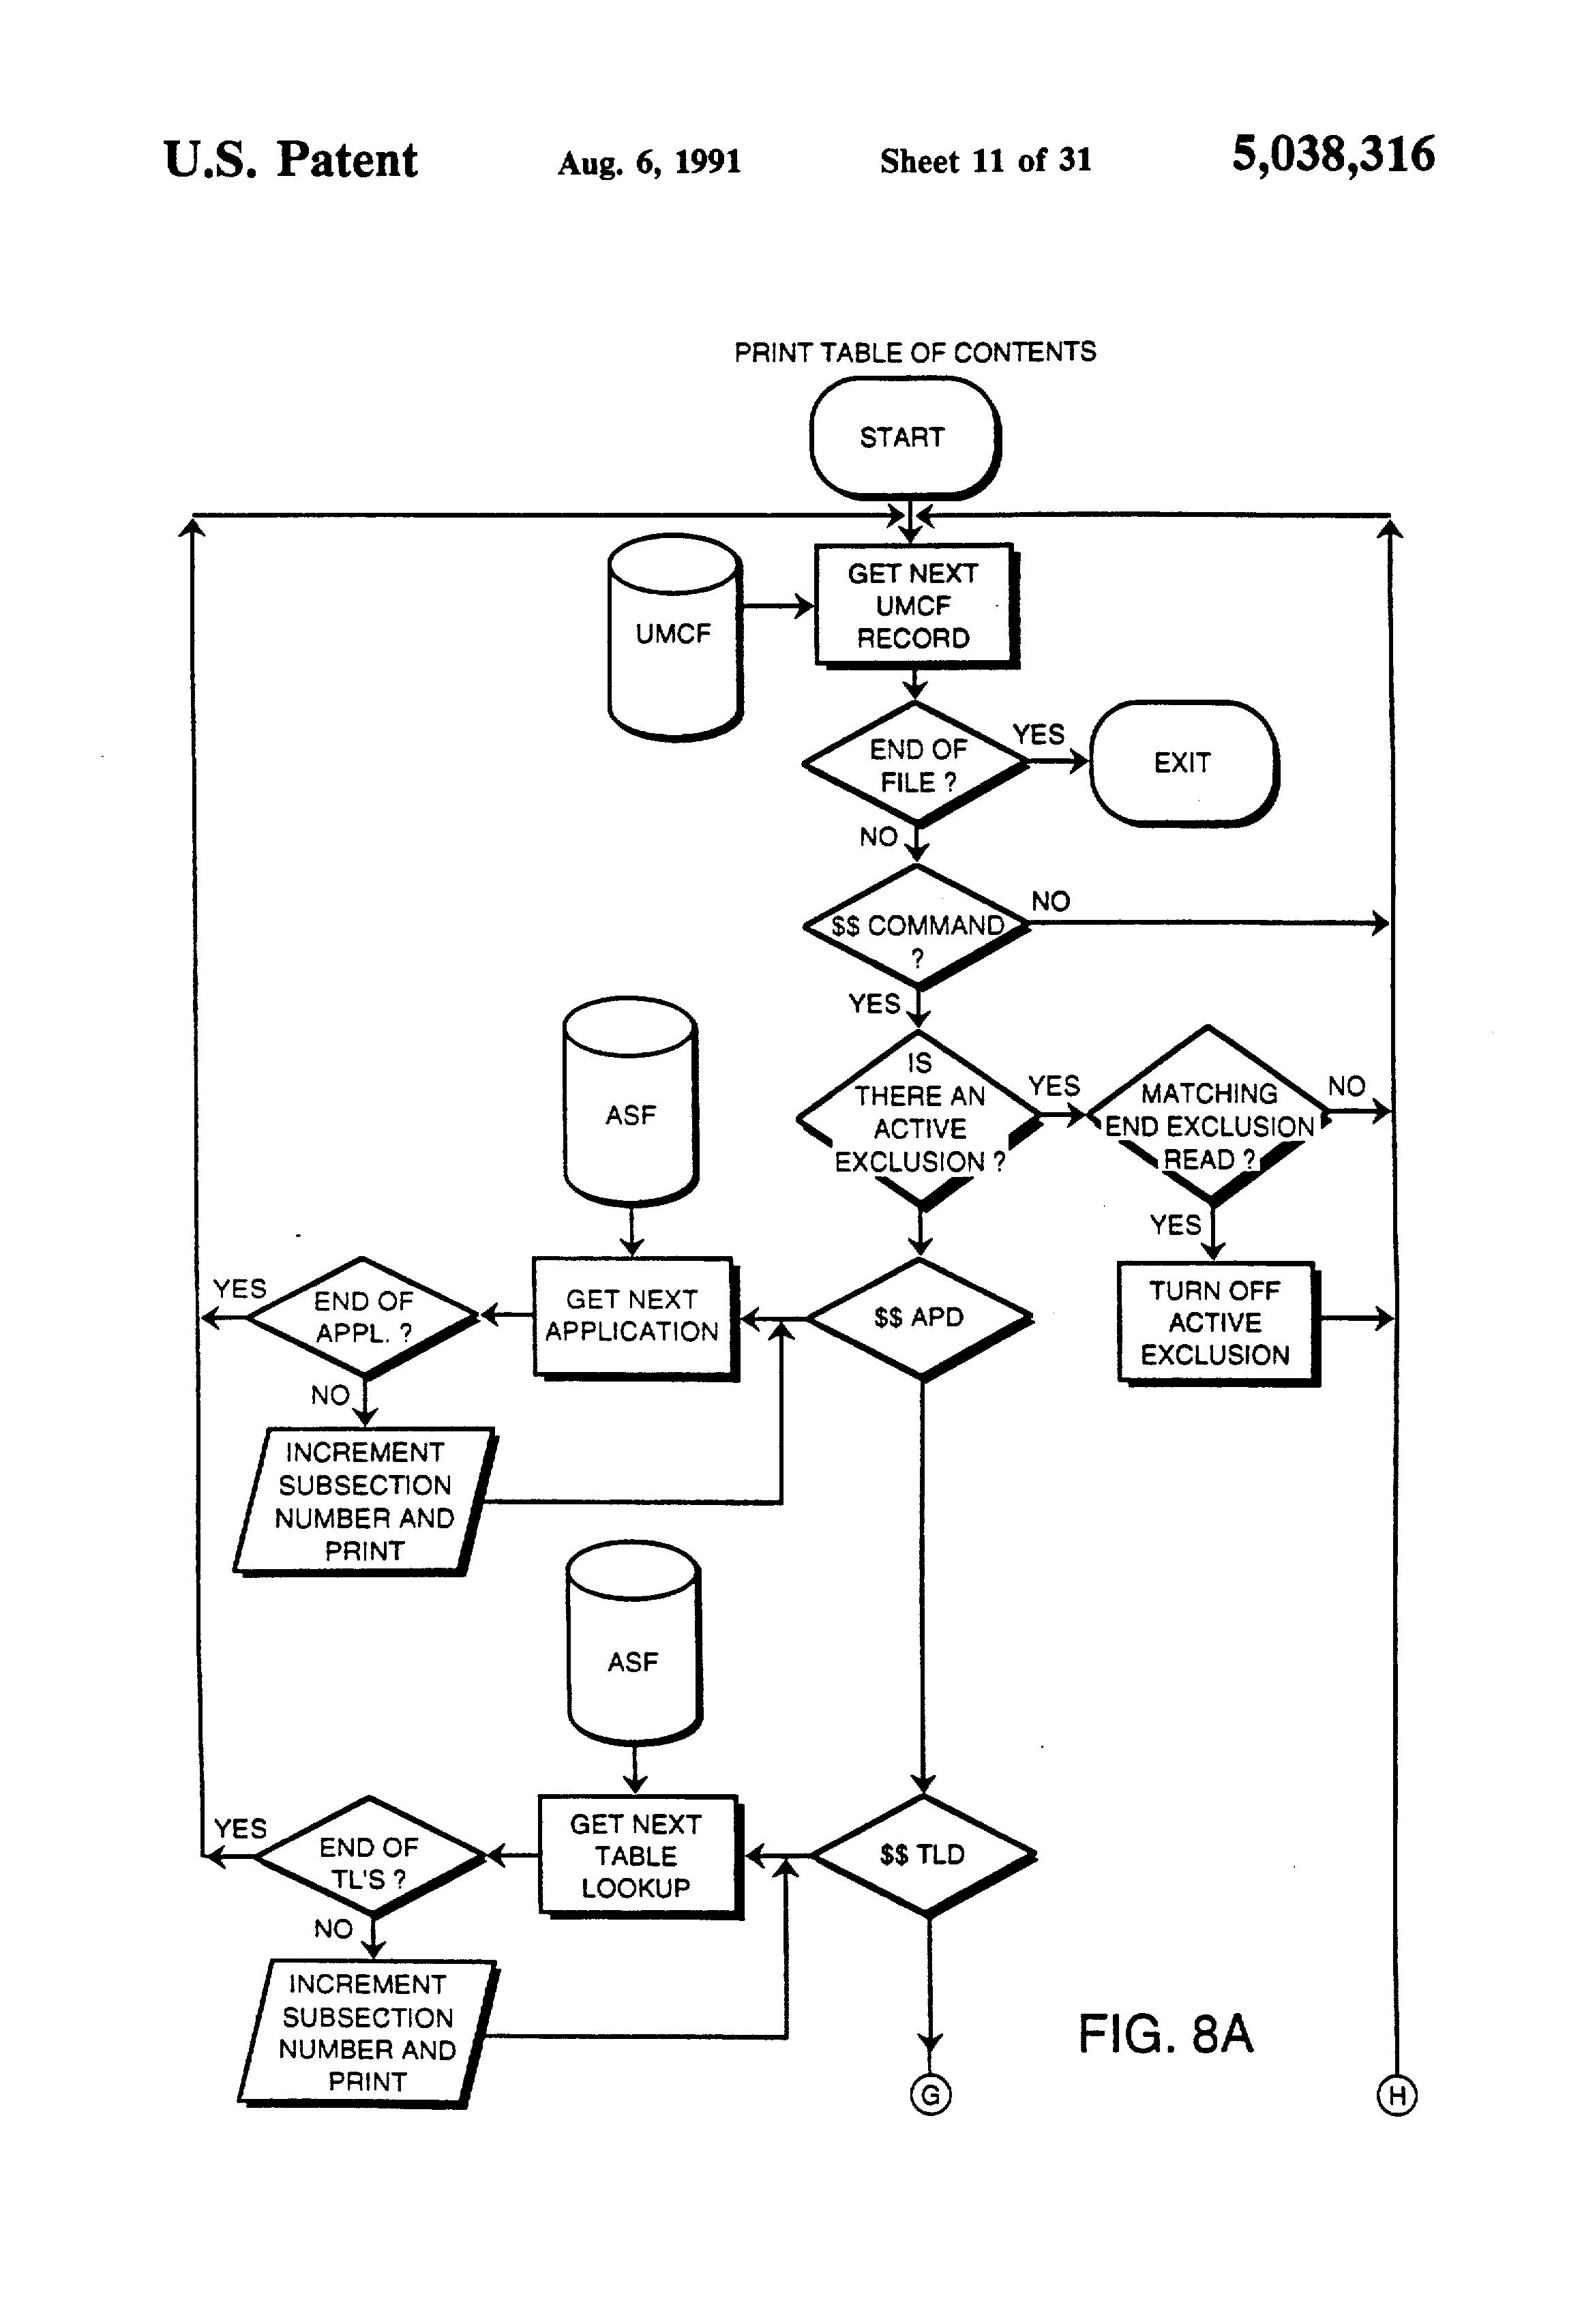 Er Diagram For Payroll System Patent Method For Generating User Documentation